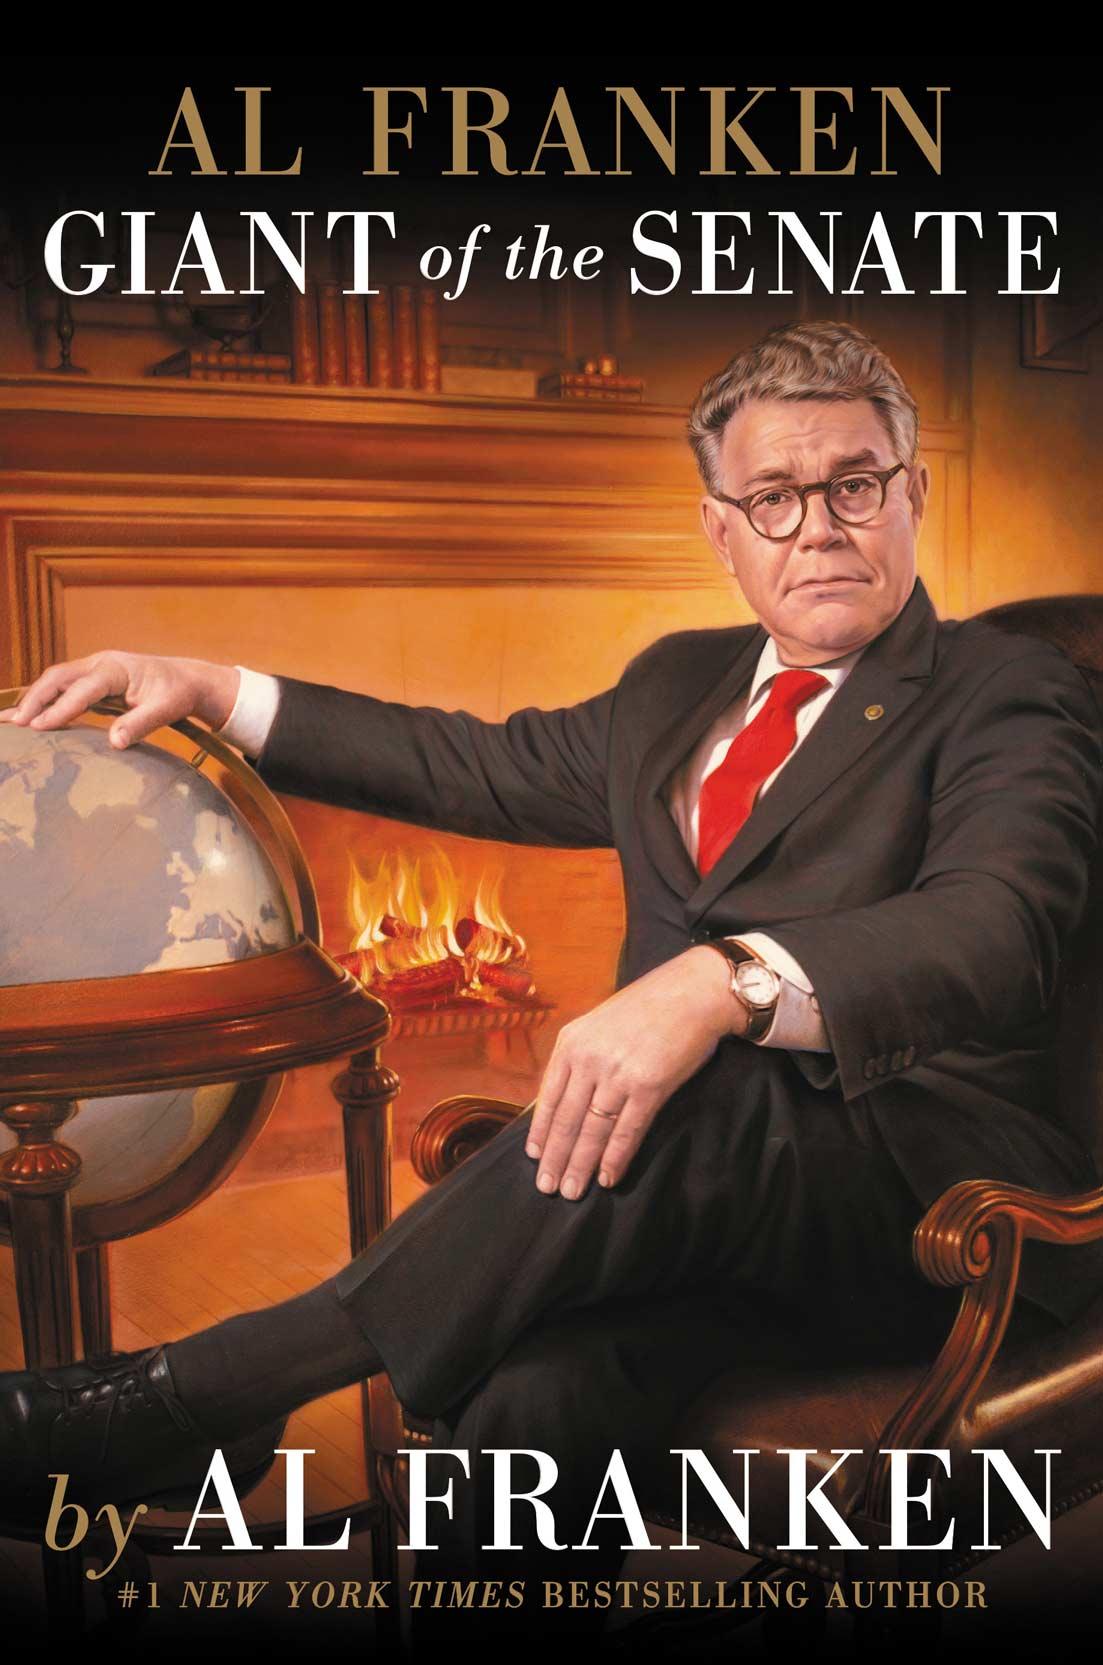 Cover Photo for Al Franken Giant of the Senate